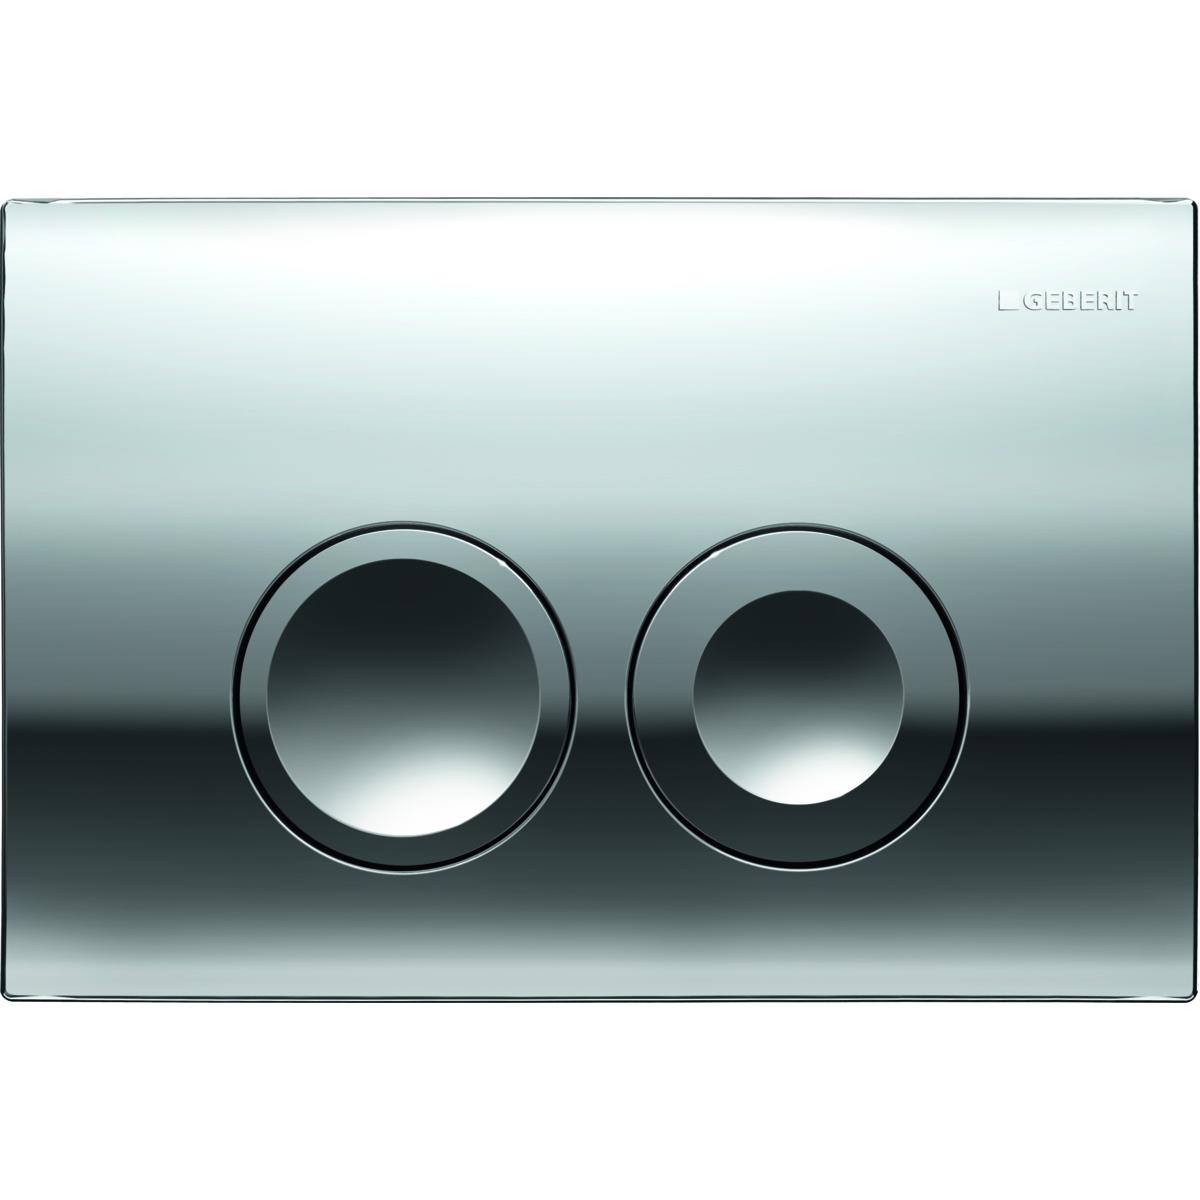 Кнопка смыва GEBERIT 115.125.21.1 Delta 21 (пластик/хром)